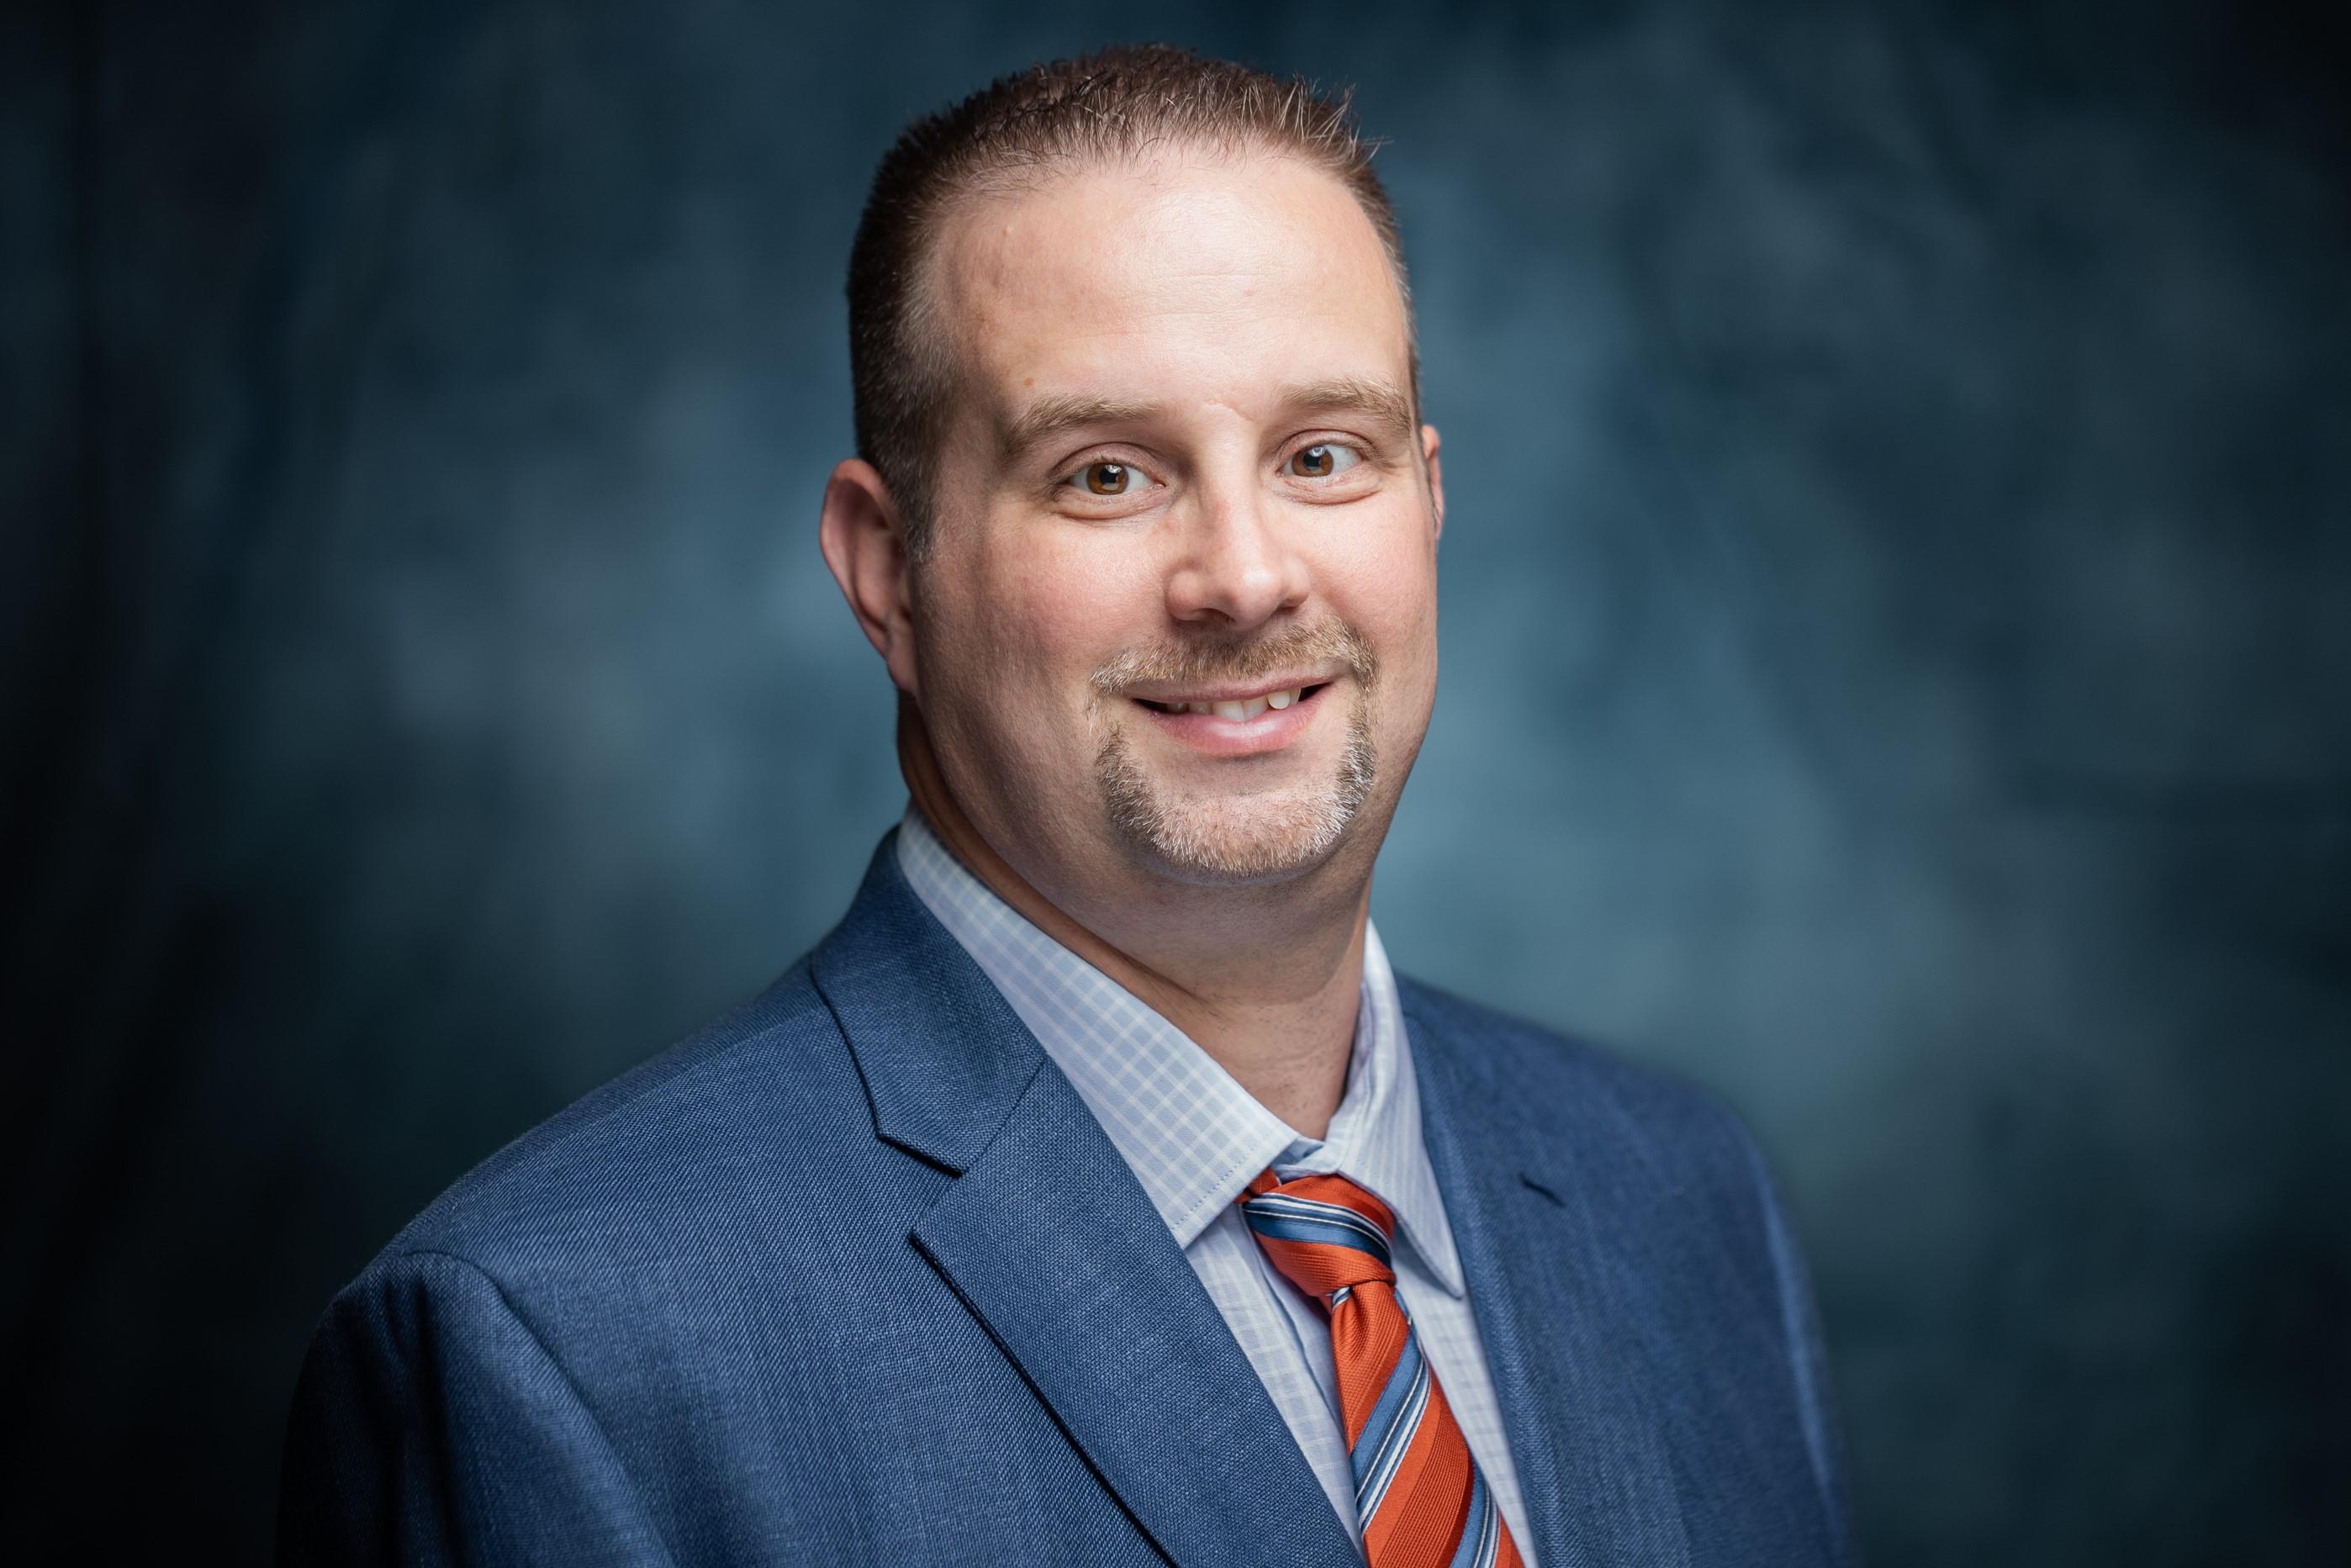 ADAM TRENTON JOHNSON Financial Professional & Insurance Agent